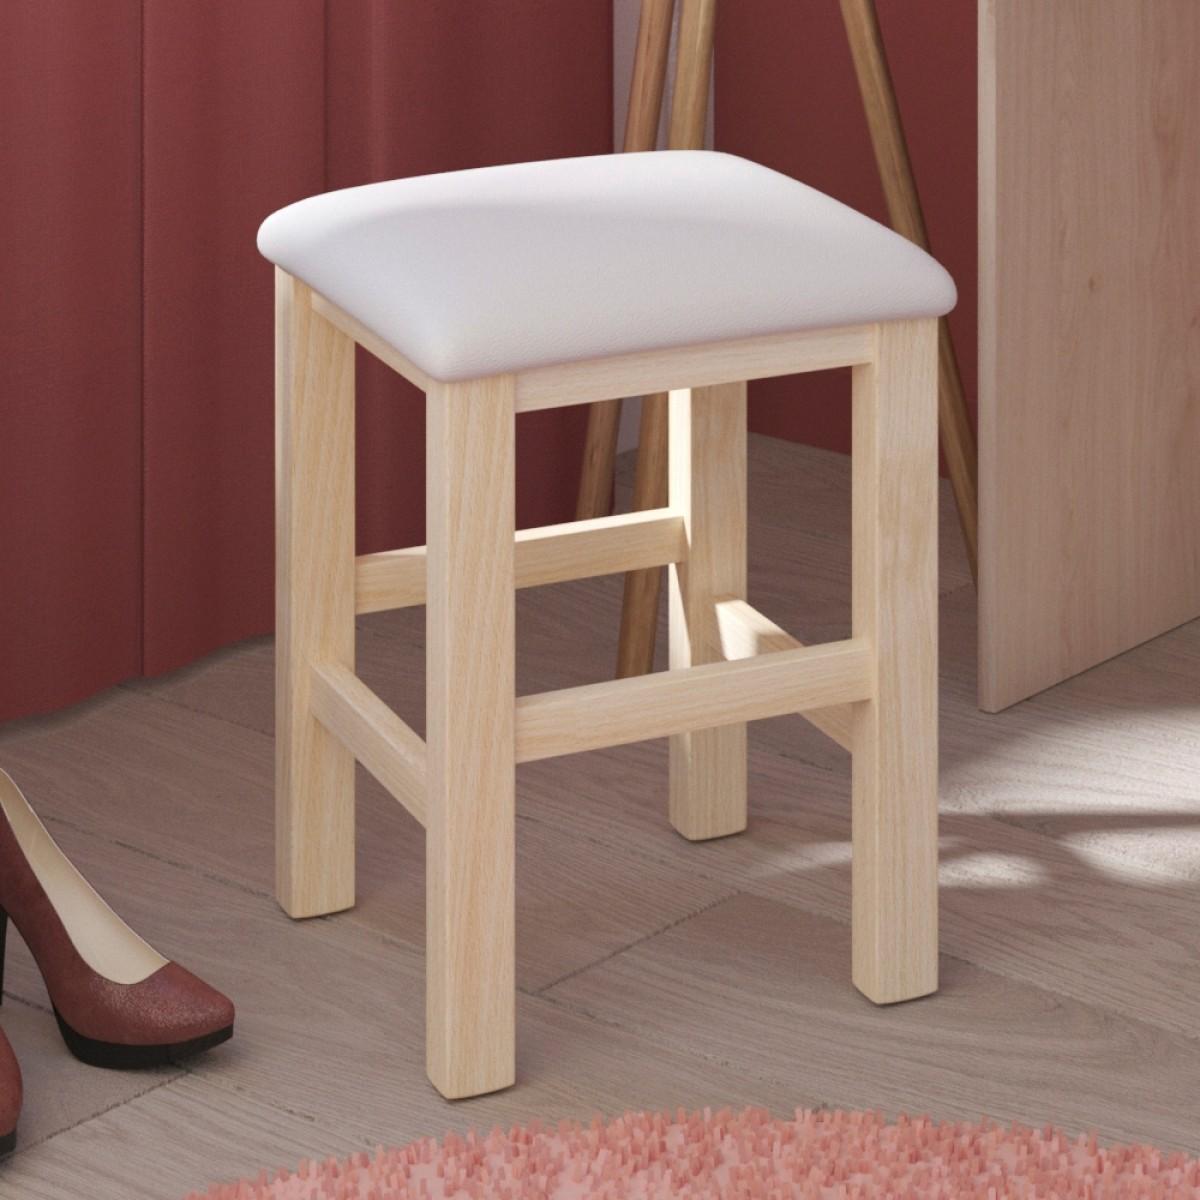 Beauty Bar Dressing Table Stool Oak and White